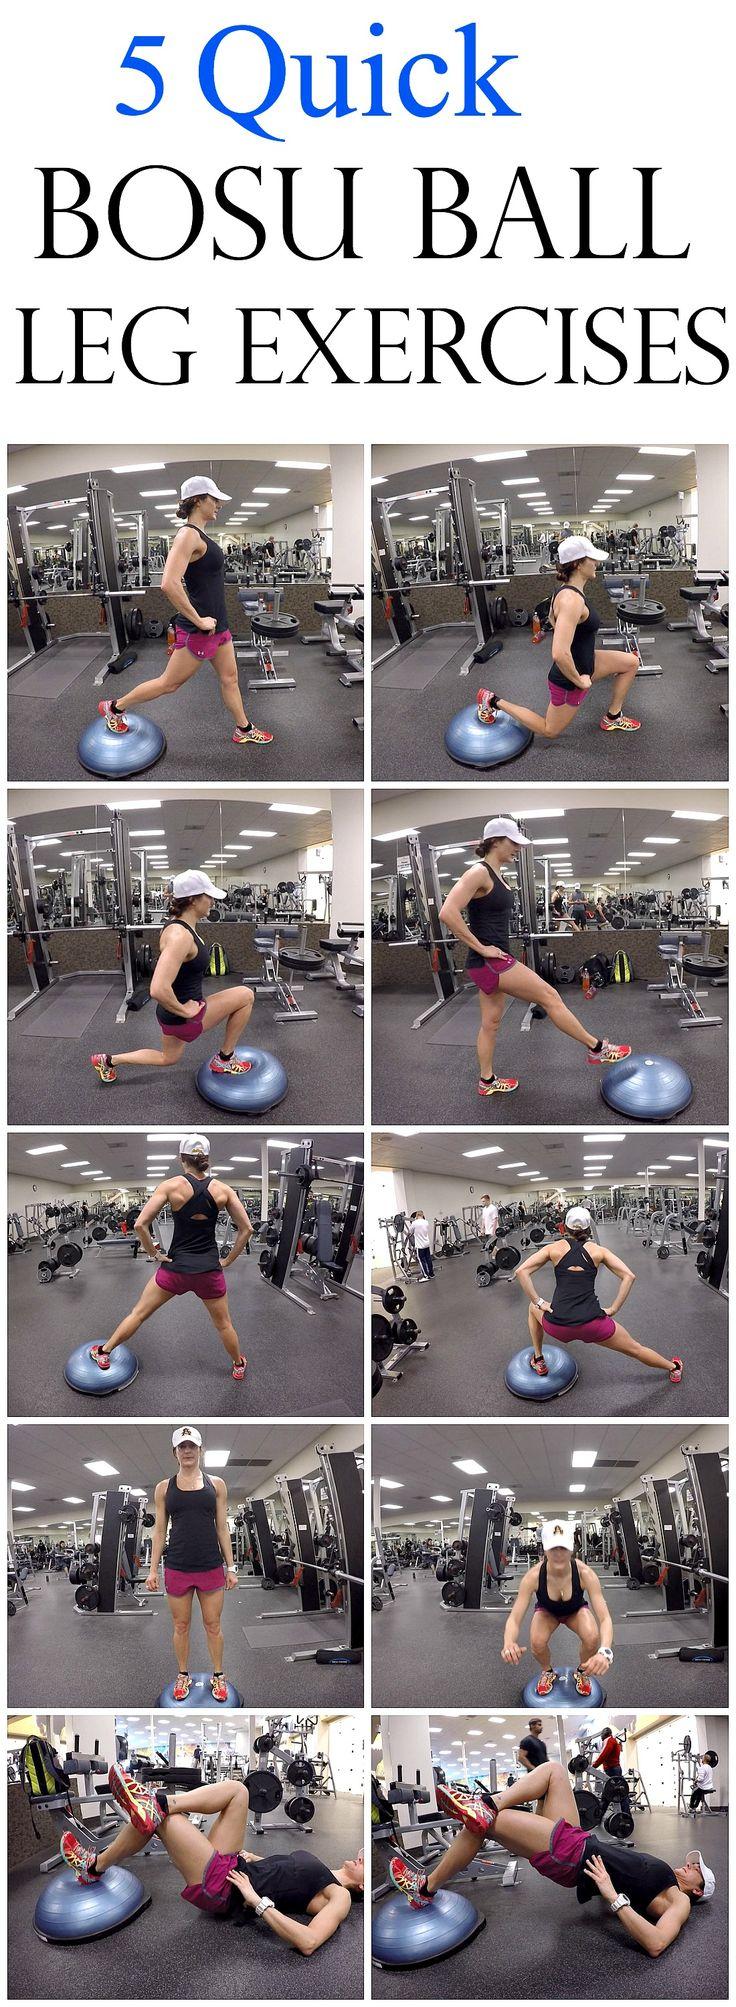 5 Quick Bosu Ball Leg Exercises